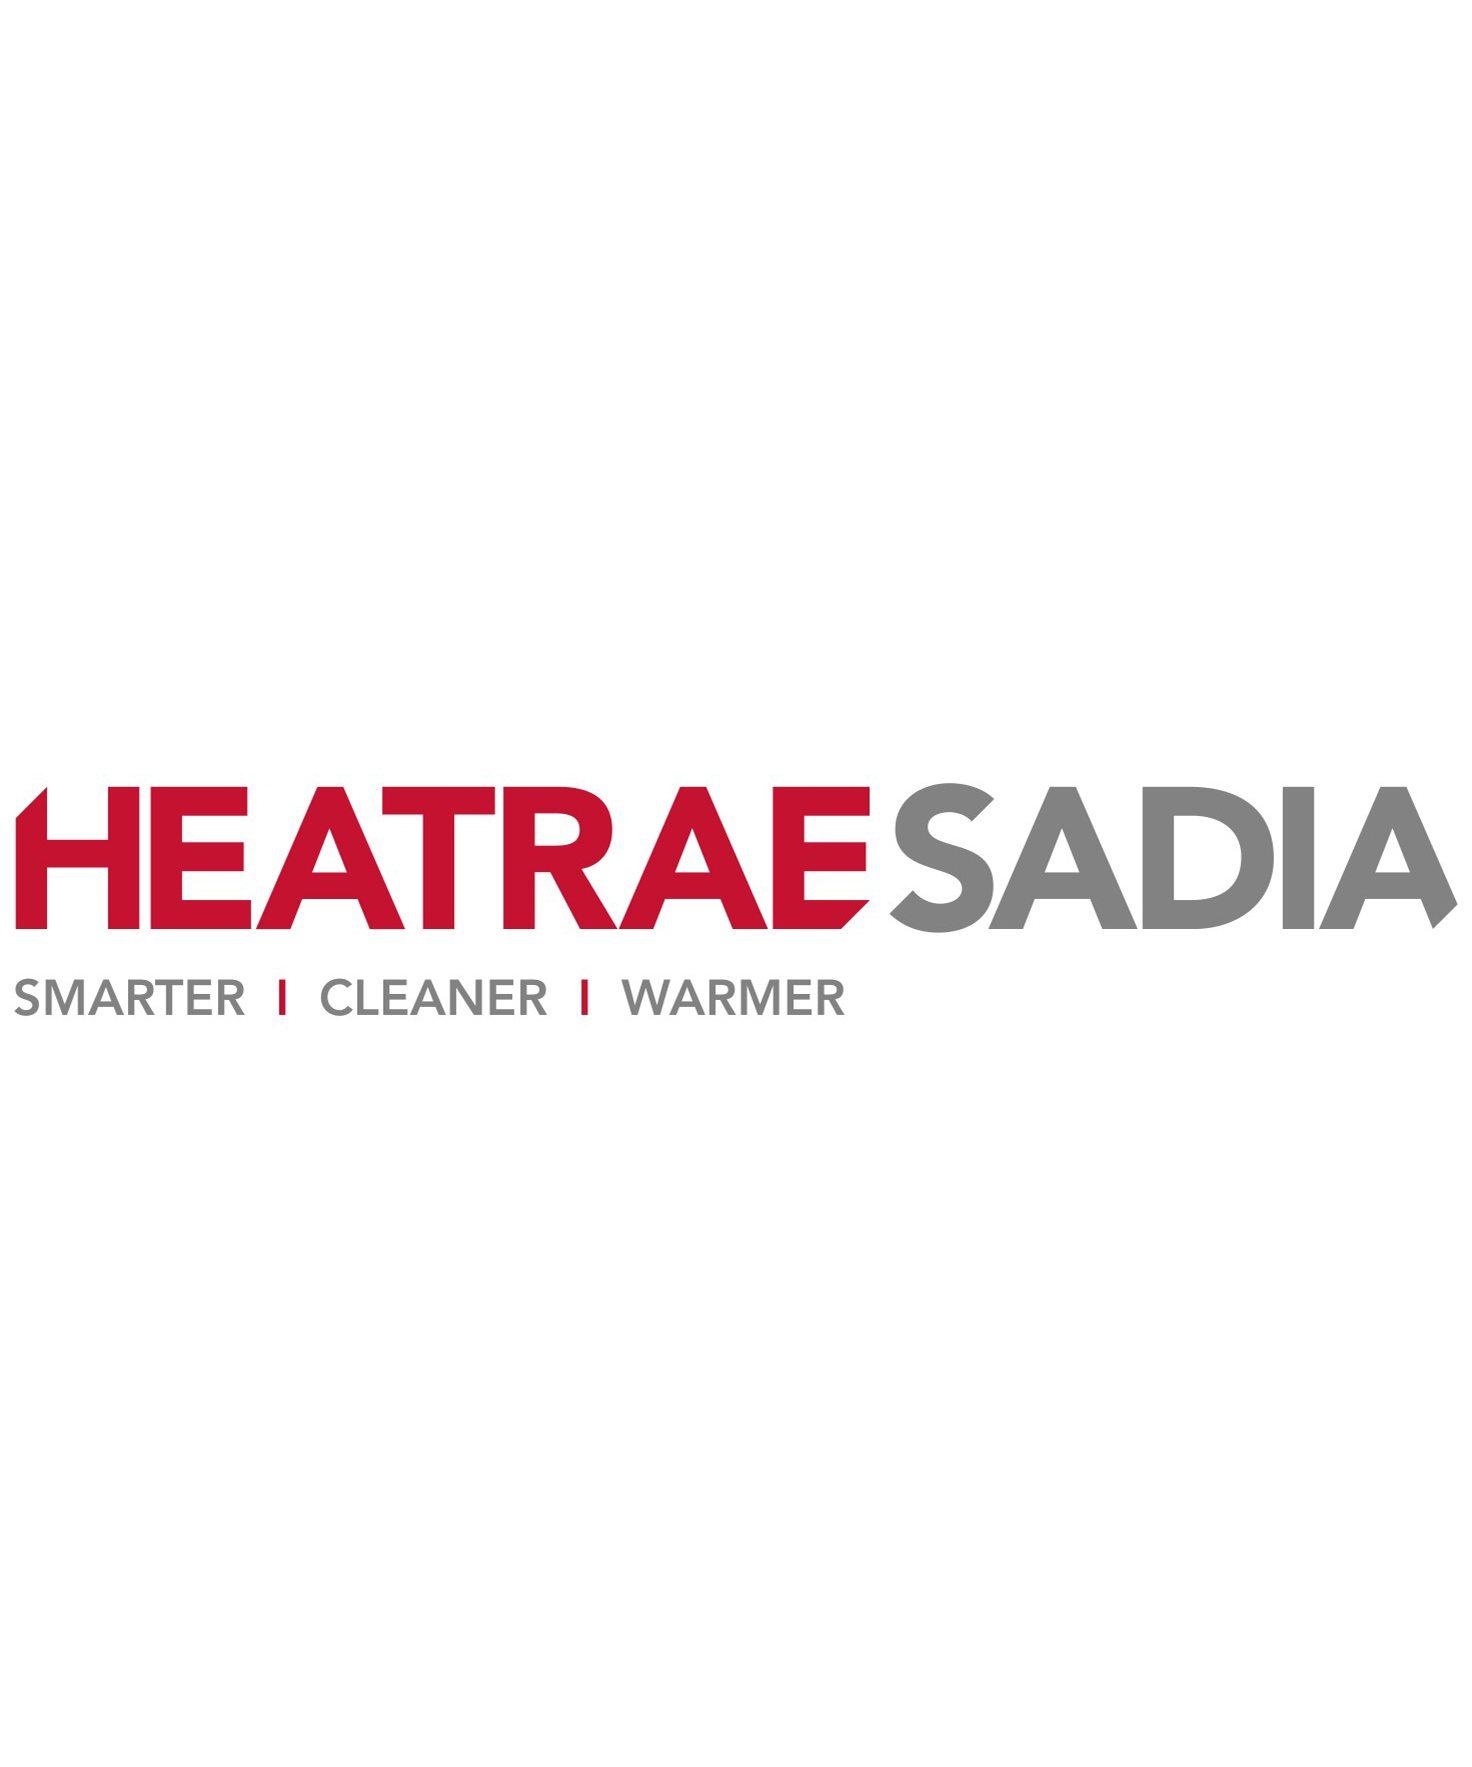 heatrae logo 1x1.2